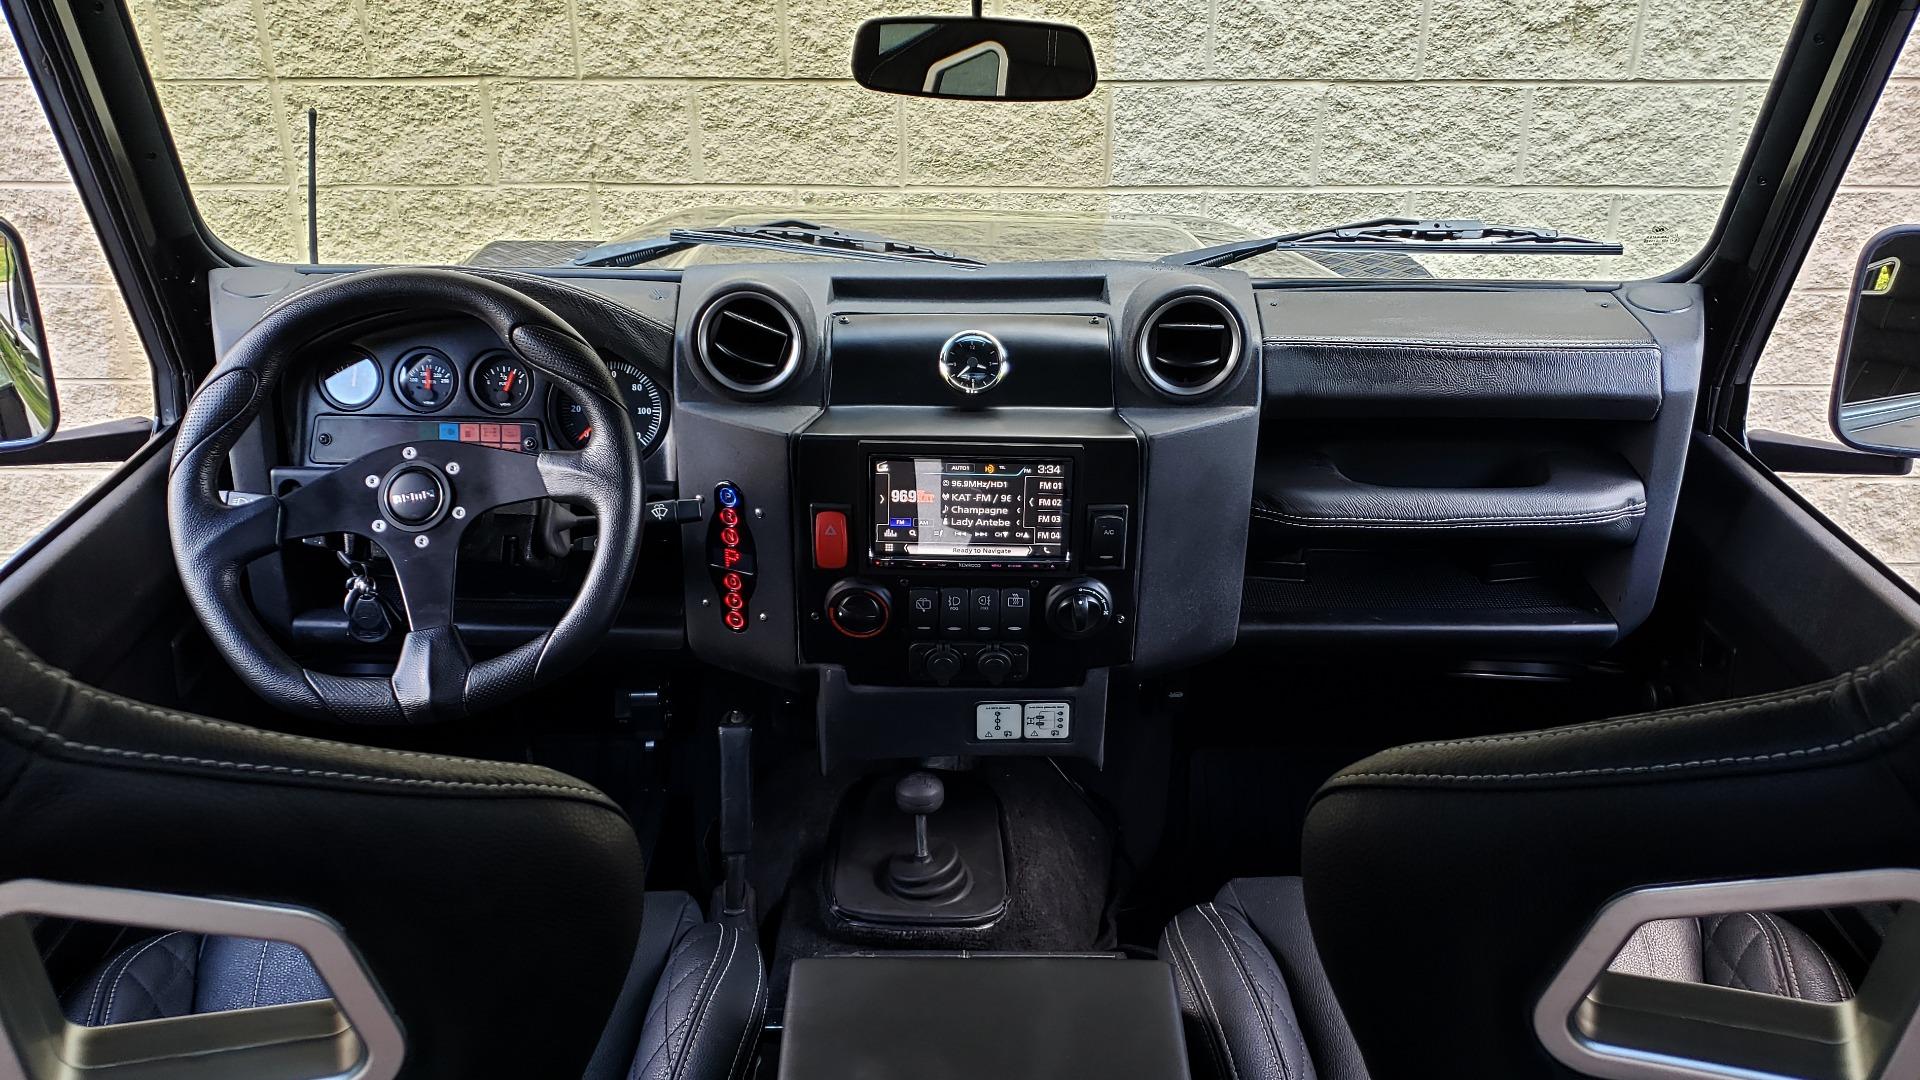 Used 1985 Land Rover DEFENDER 90 4X4 CUSTOM RESTORED 5.3L LS V8 for sale Sold at Formula Imports in Charlotte NC 28227 49